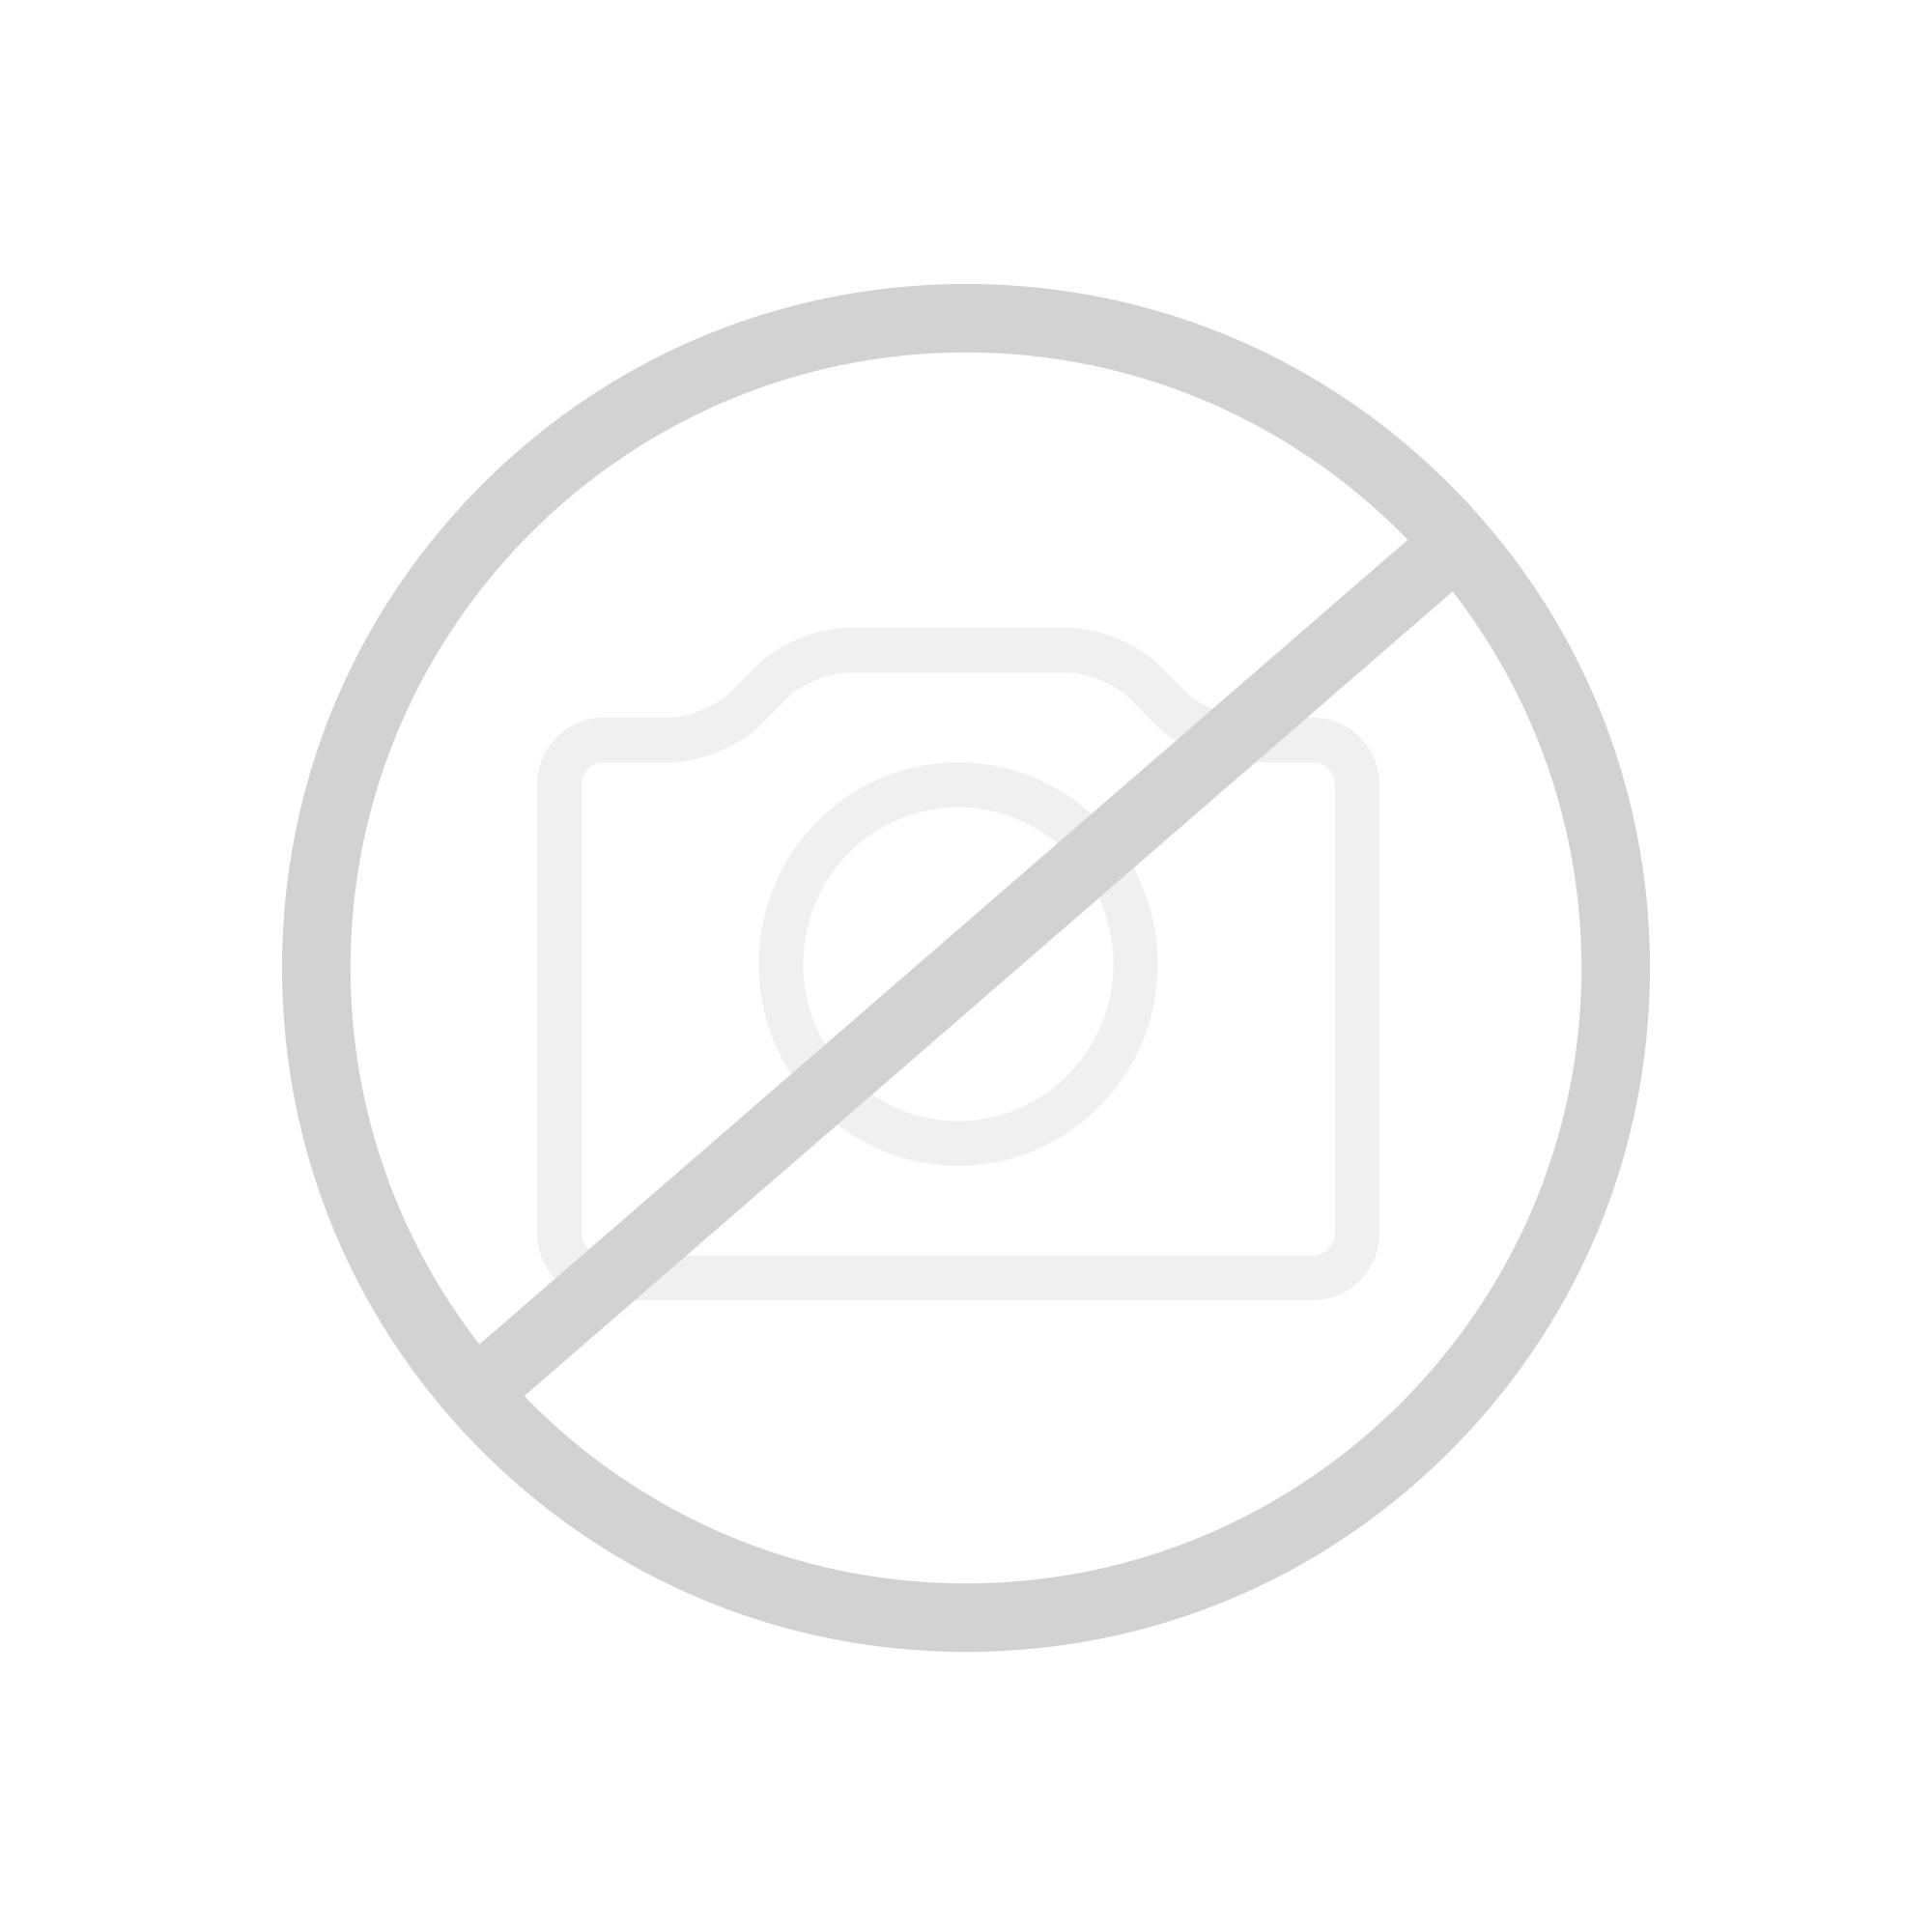 louis poulsen NJP LED Stehleuchte mit Dimmer